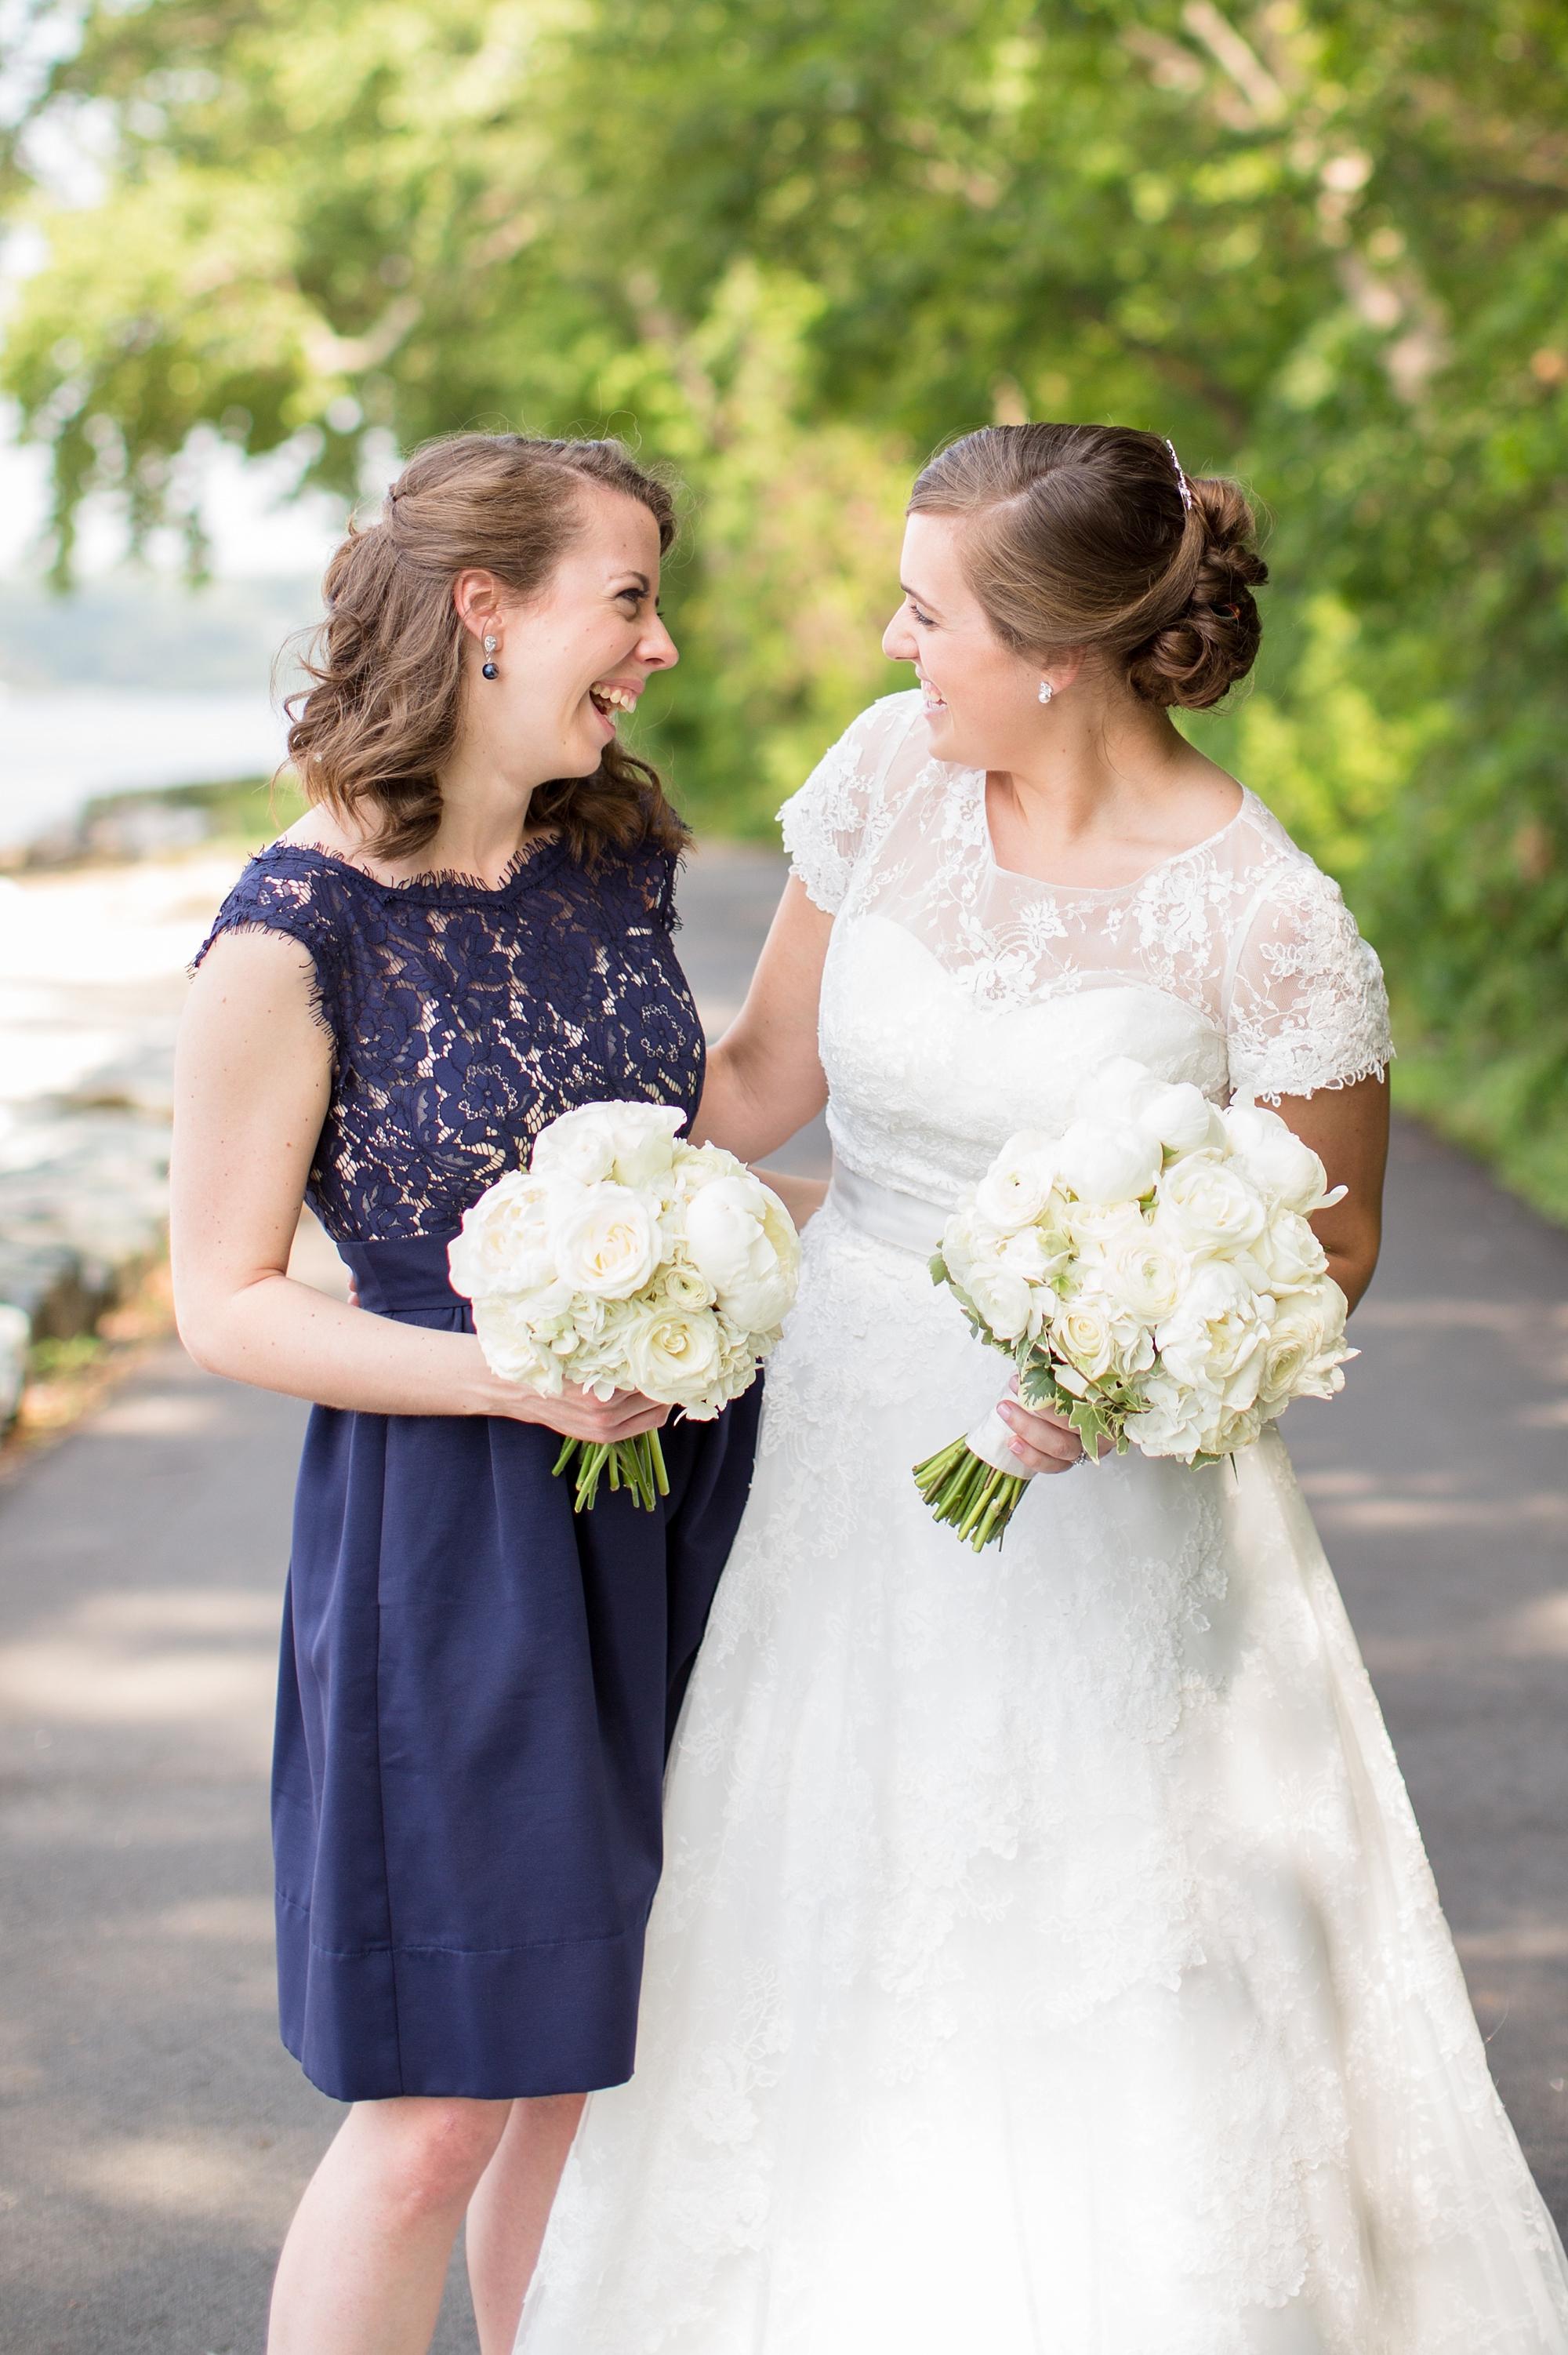 Somerville 5-Bridal Party-1060_anna grace photography sherwood forest annapolis maryland wedding photographer photo.jpg